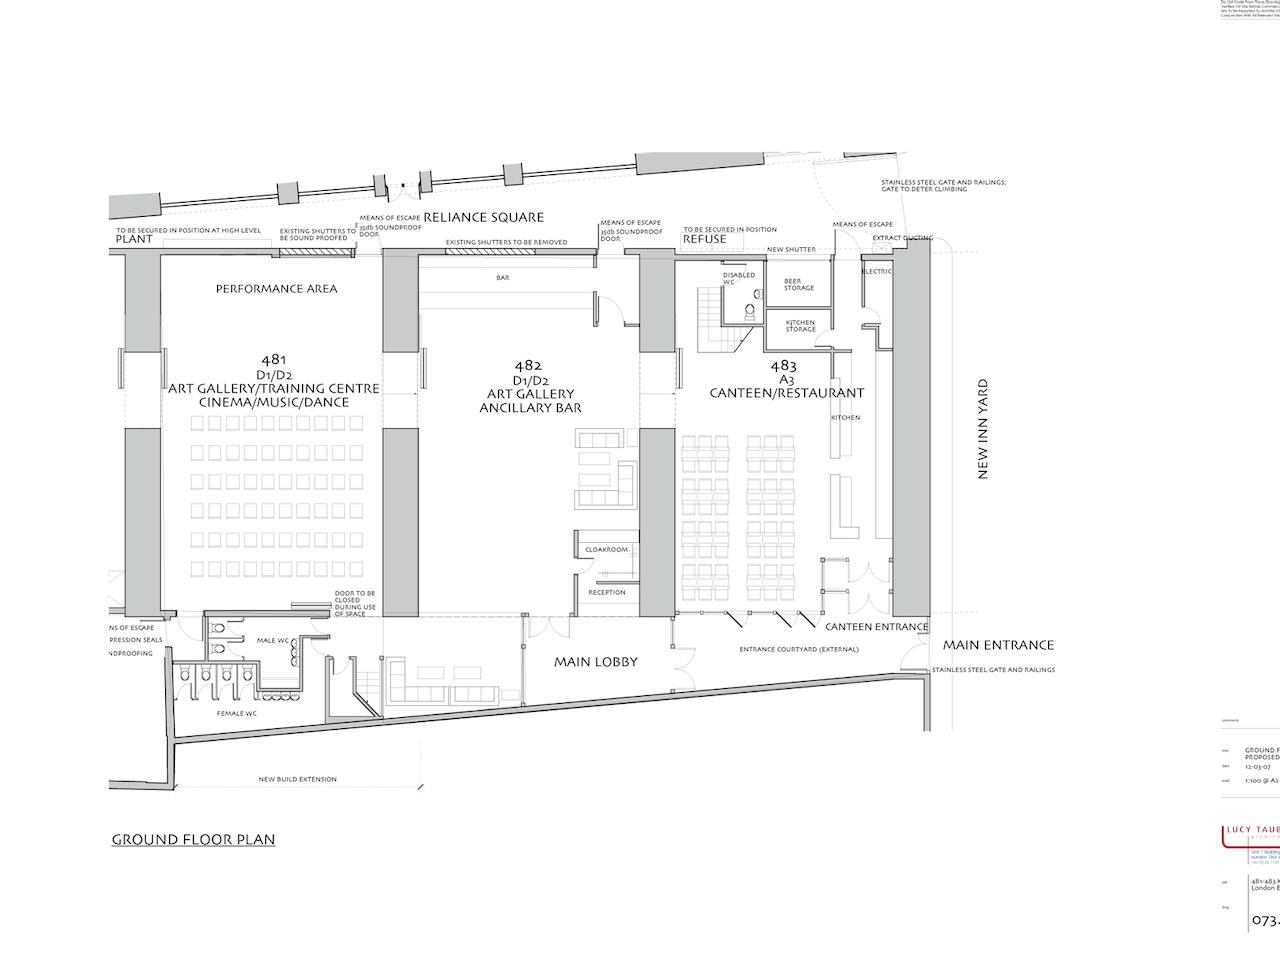 Commercial Event Space, Kingsland Viaduct, Shoreditch